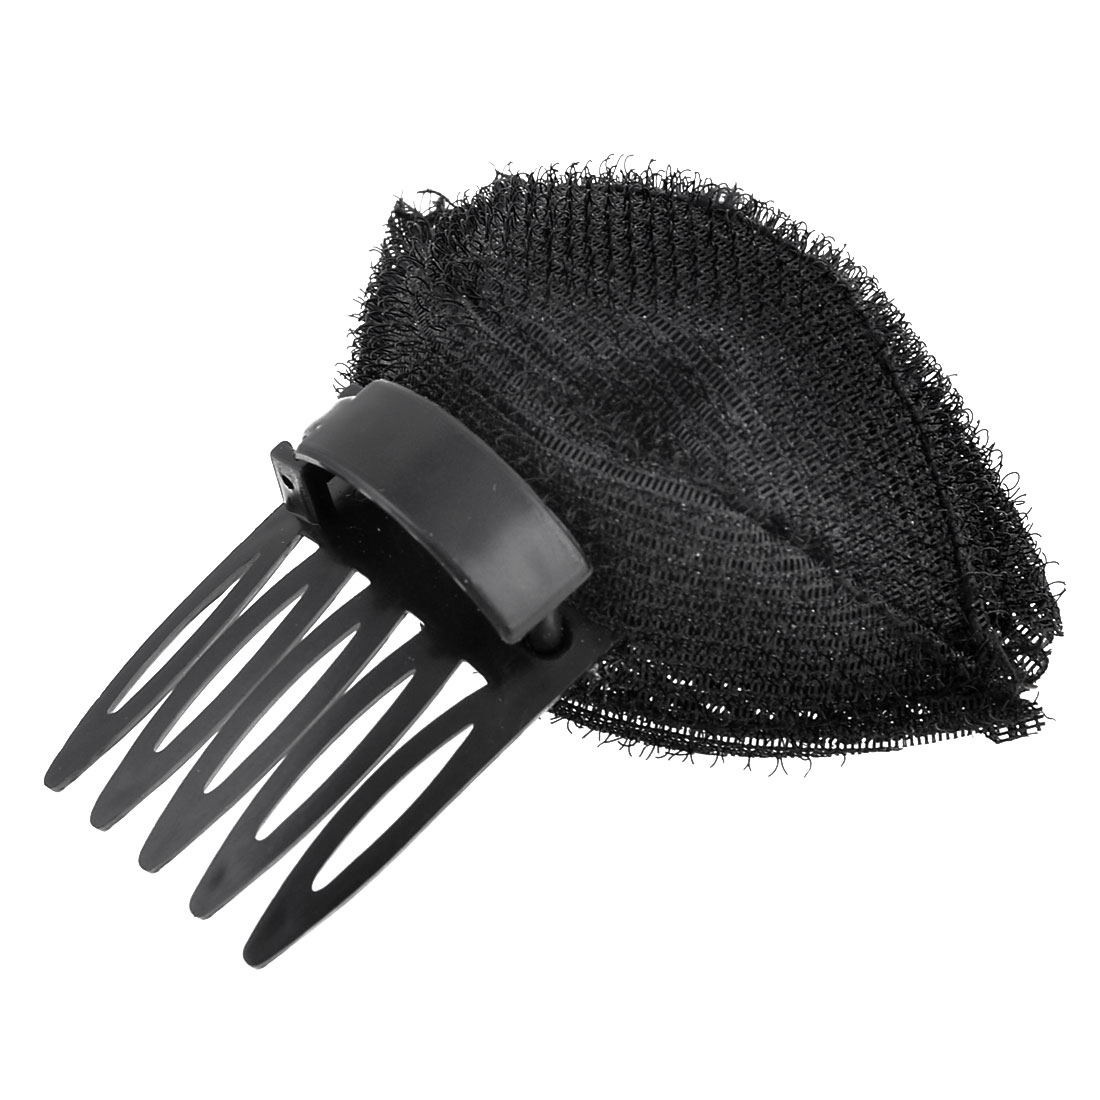 Unisex Plastic Pompadour Fringe Up Do Insert Tool Elegant Magic Hair Base Black